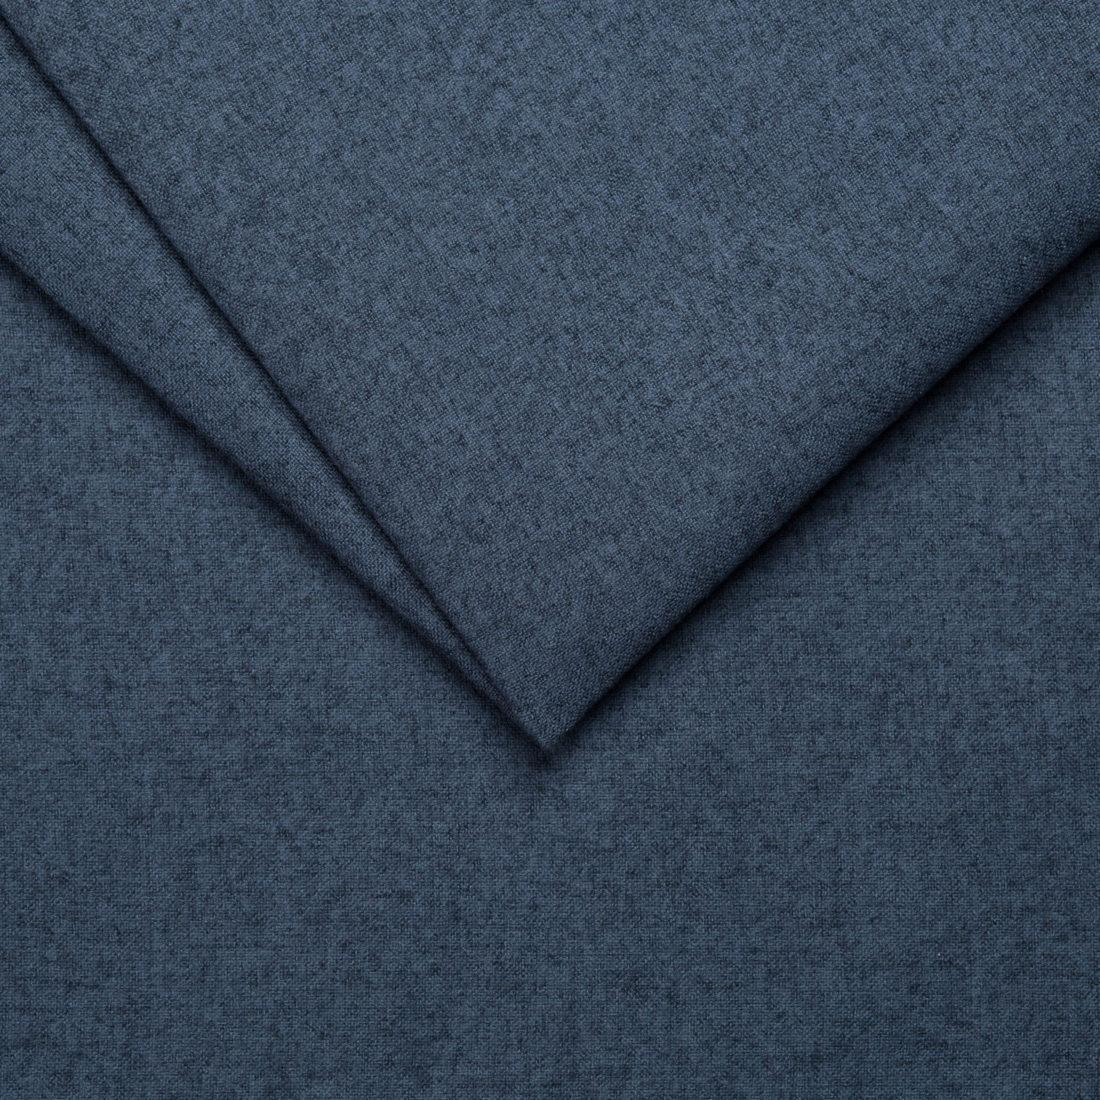 Меблева тканина Cashmere 16 Blue, рогожка